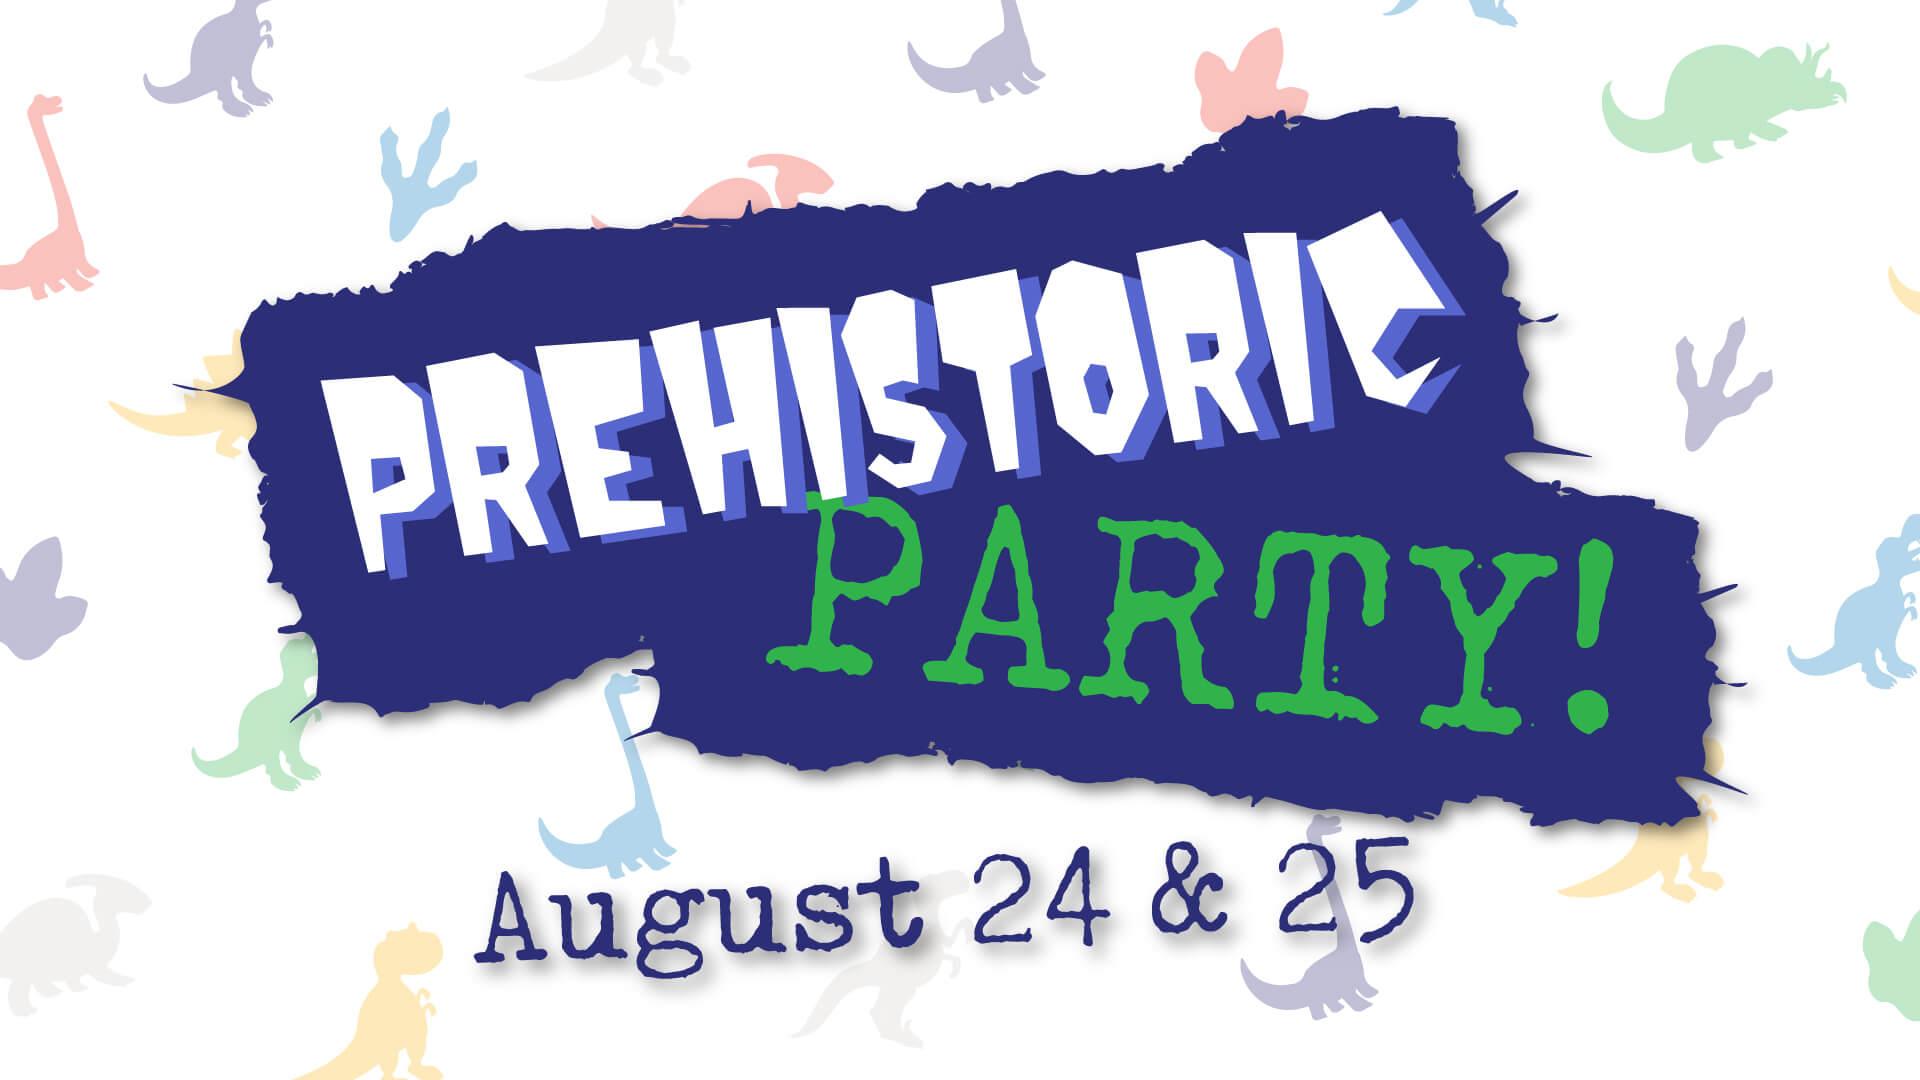 Prehistoric party flyer